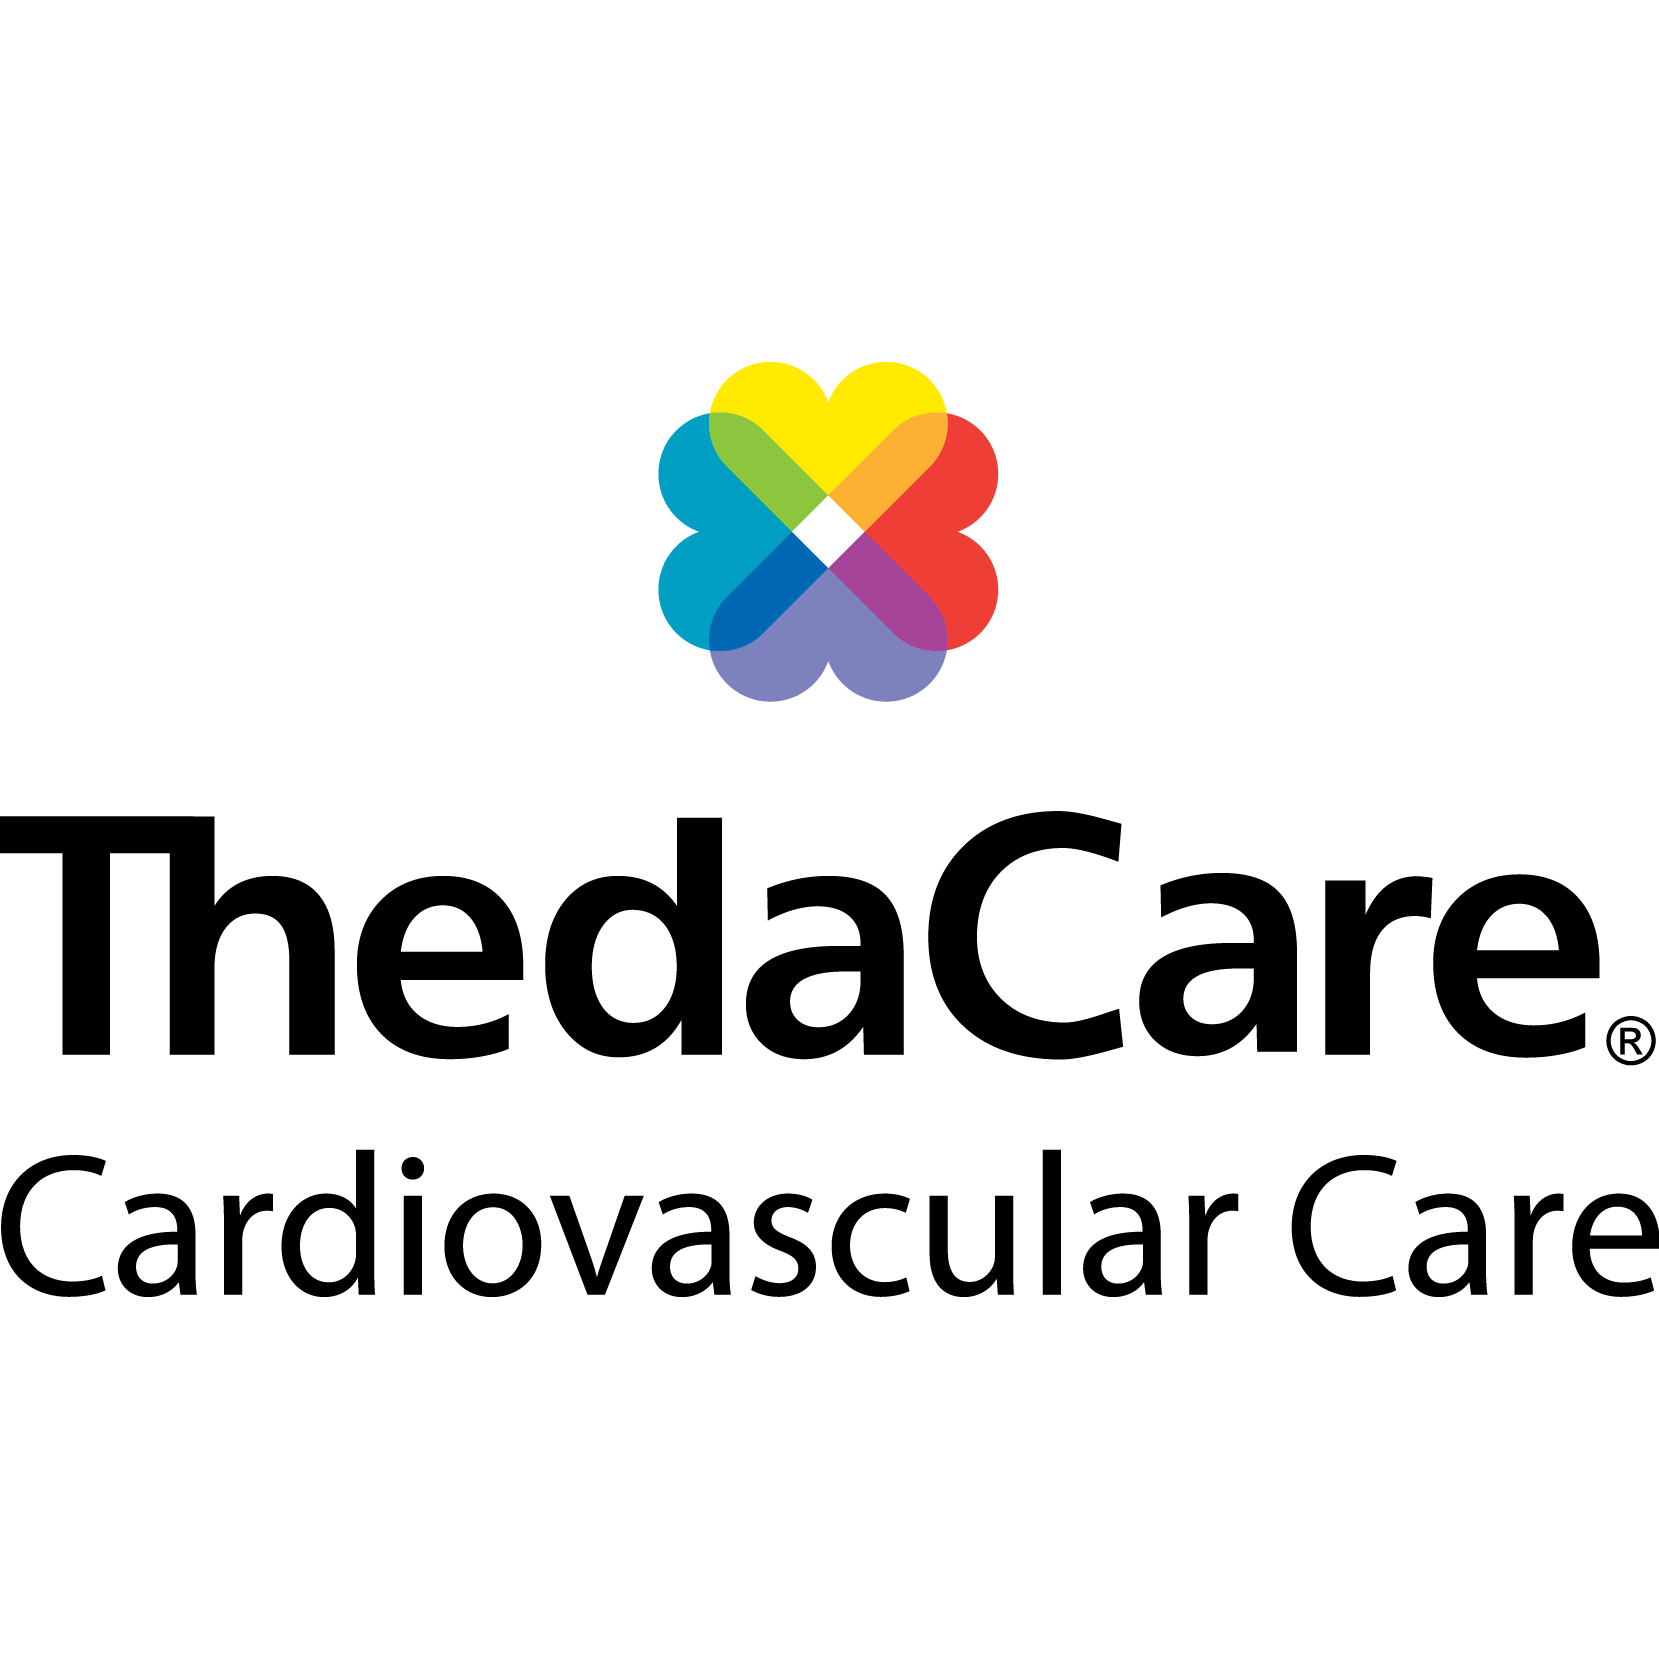 ThedaCare Cardiovascular Care image 2